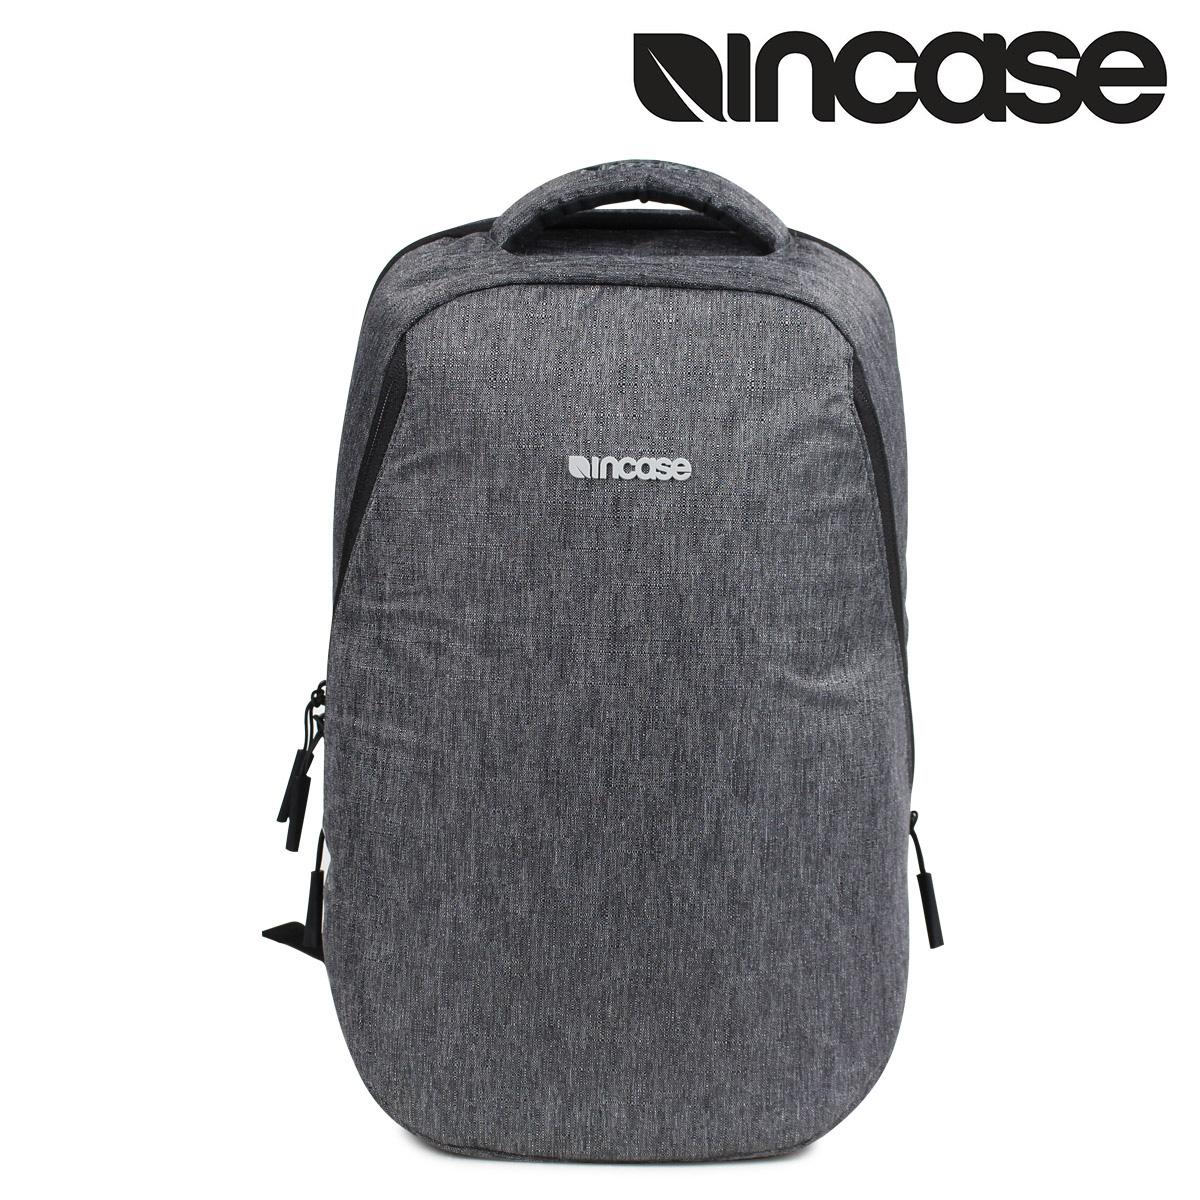 INCASE 13INCH REFORM BACKPACK インケース リュック バックパック バッグ メンズ 18.5L ヘザー ブラック CL55589